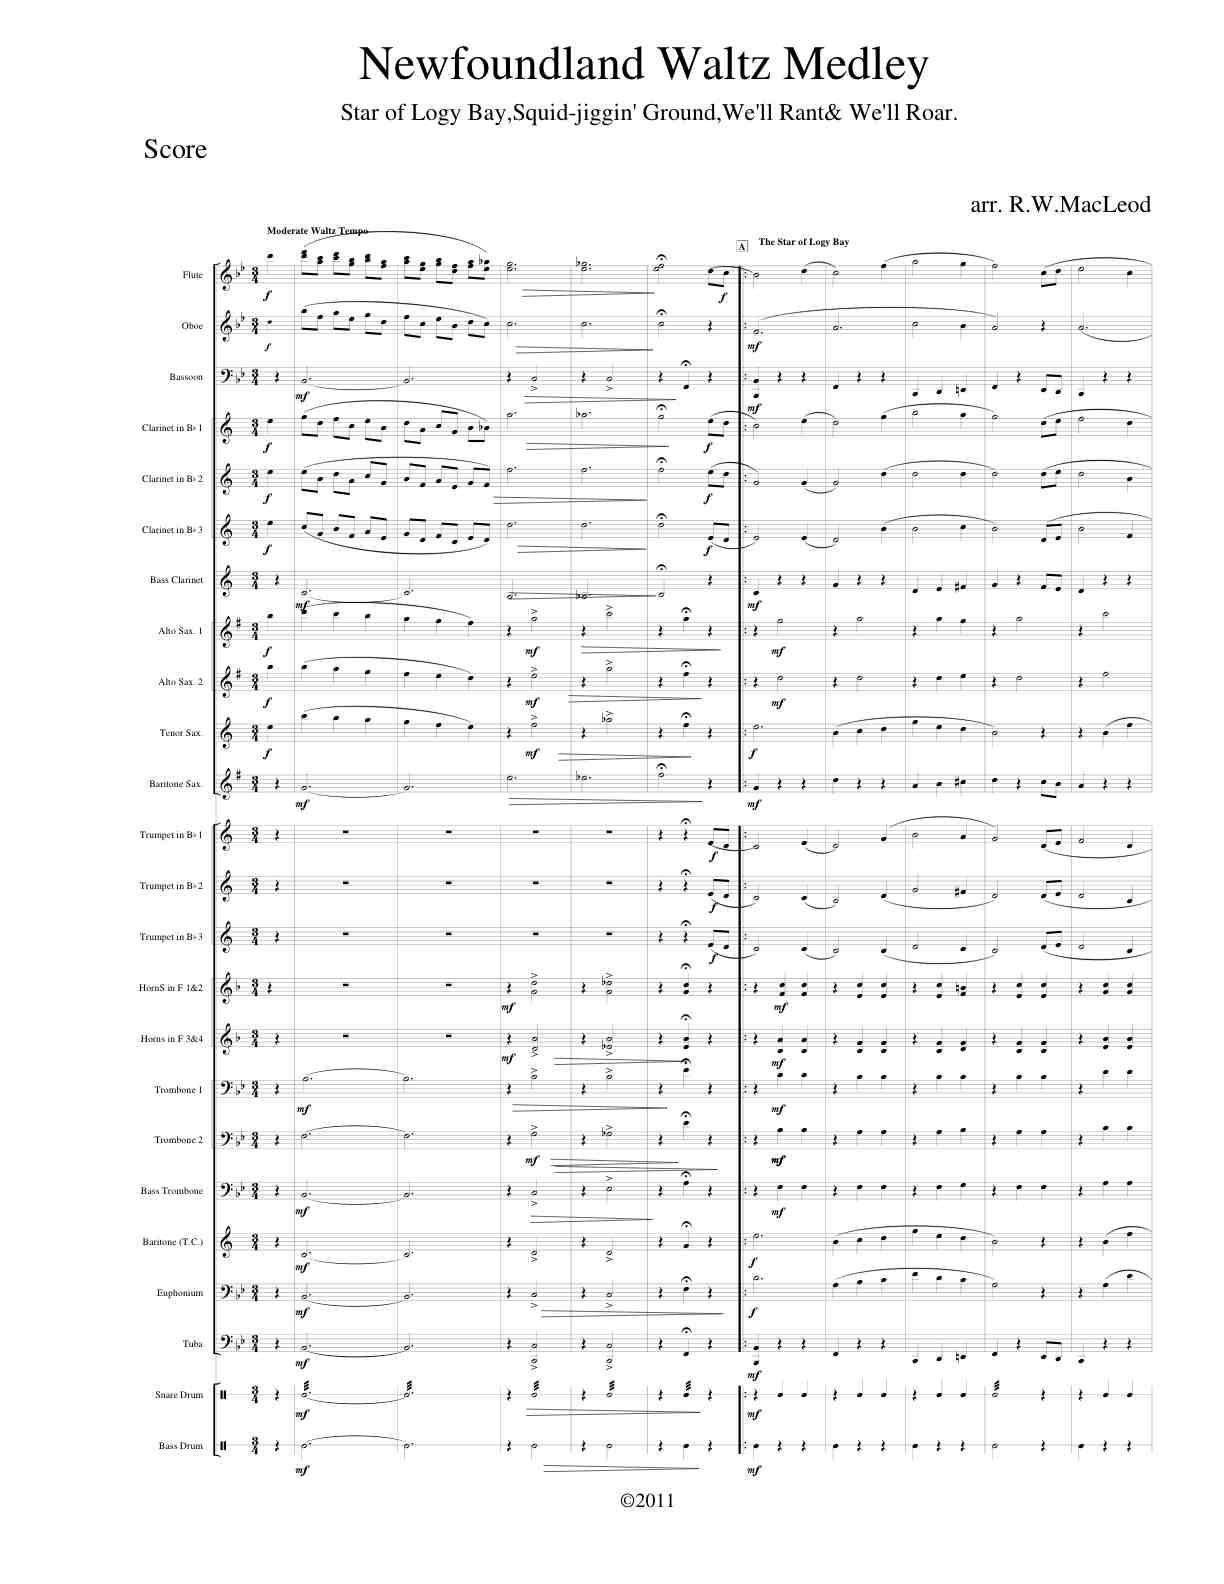 Nfld Waltz medley cover